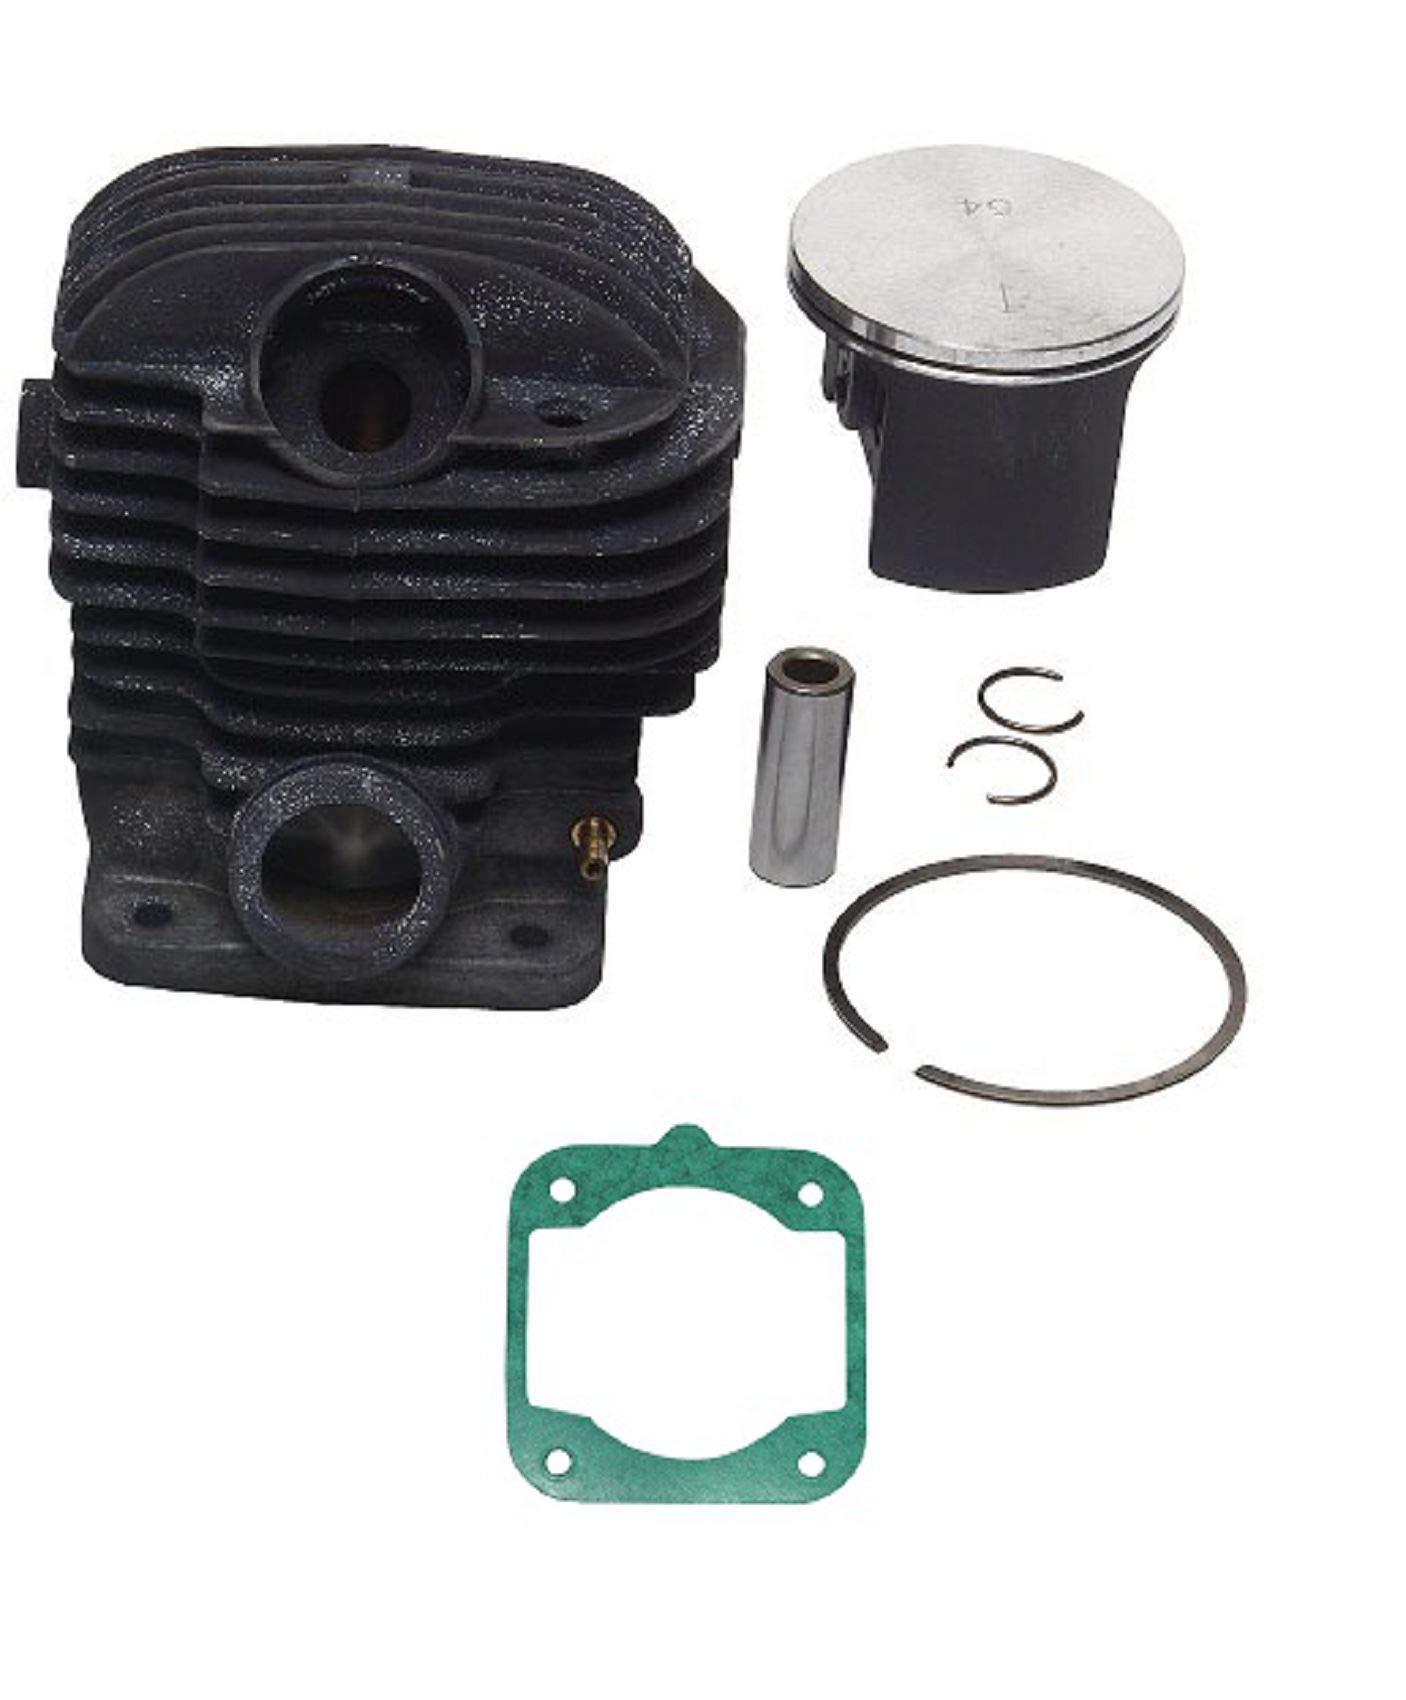 SPERTEK Big Bore Nikasil Plated Cylinder & Piston kit & Gasket Head for Dolmar/Makita (54mm) DCS6401, DCS6421